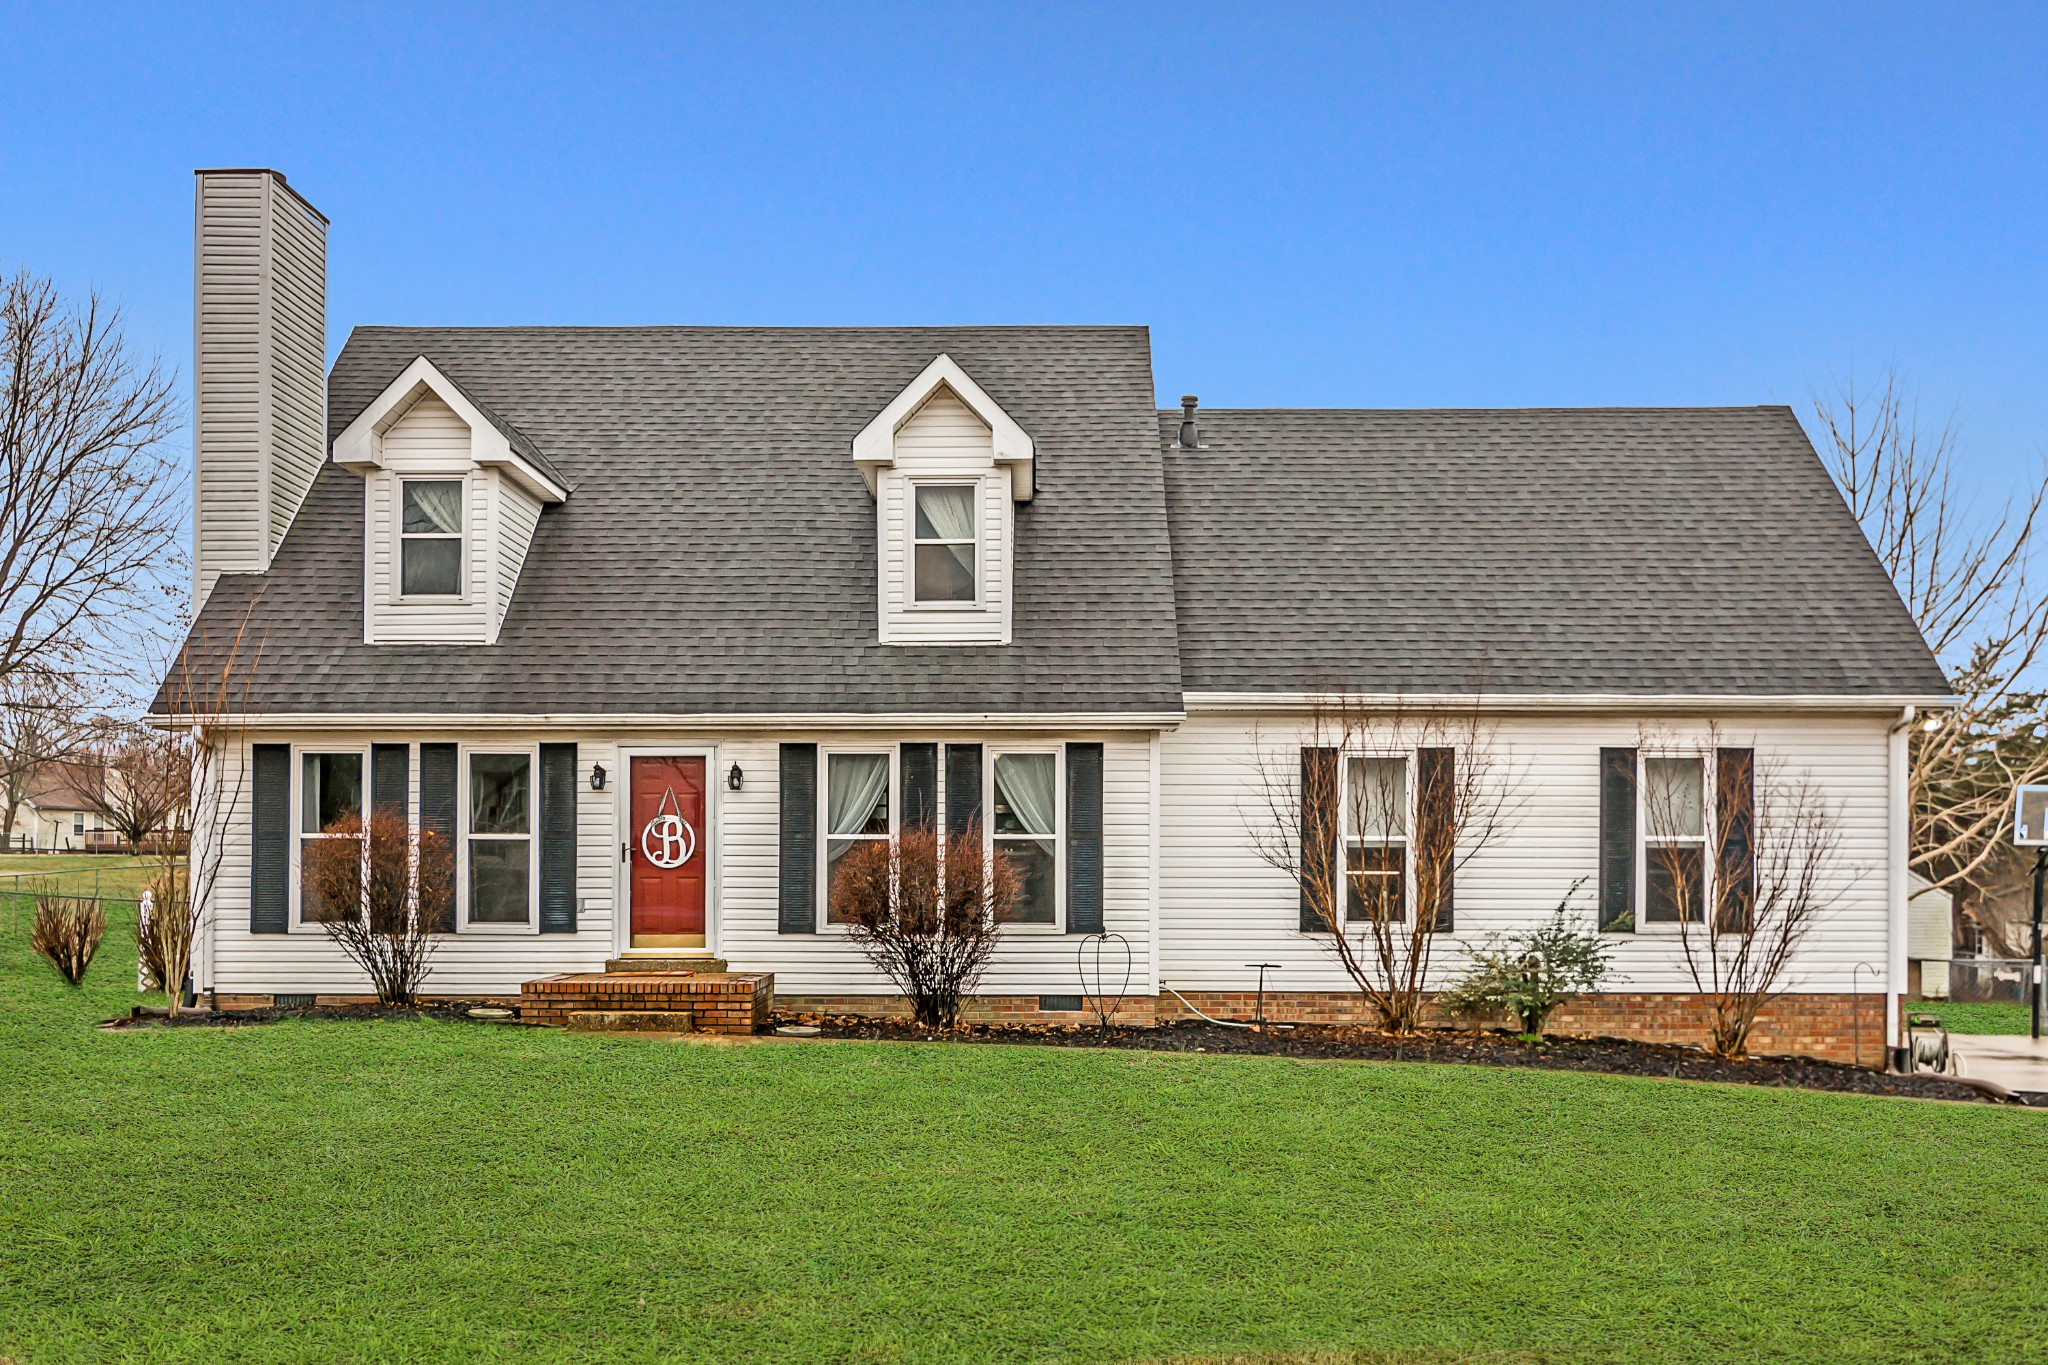 1056 Forest Xing, Joelton, TN 37080 - Joelton, TN real estate listing